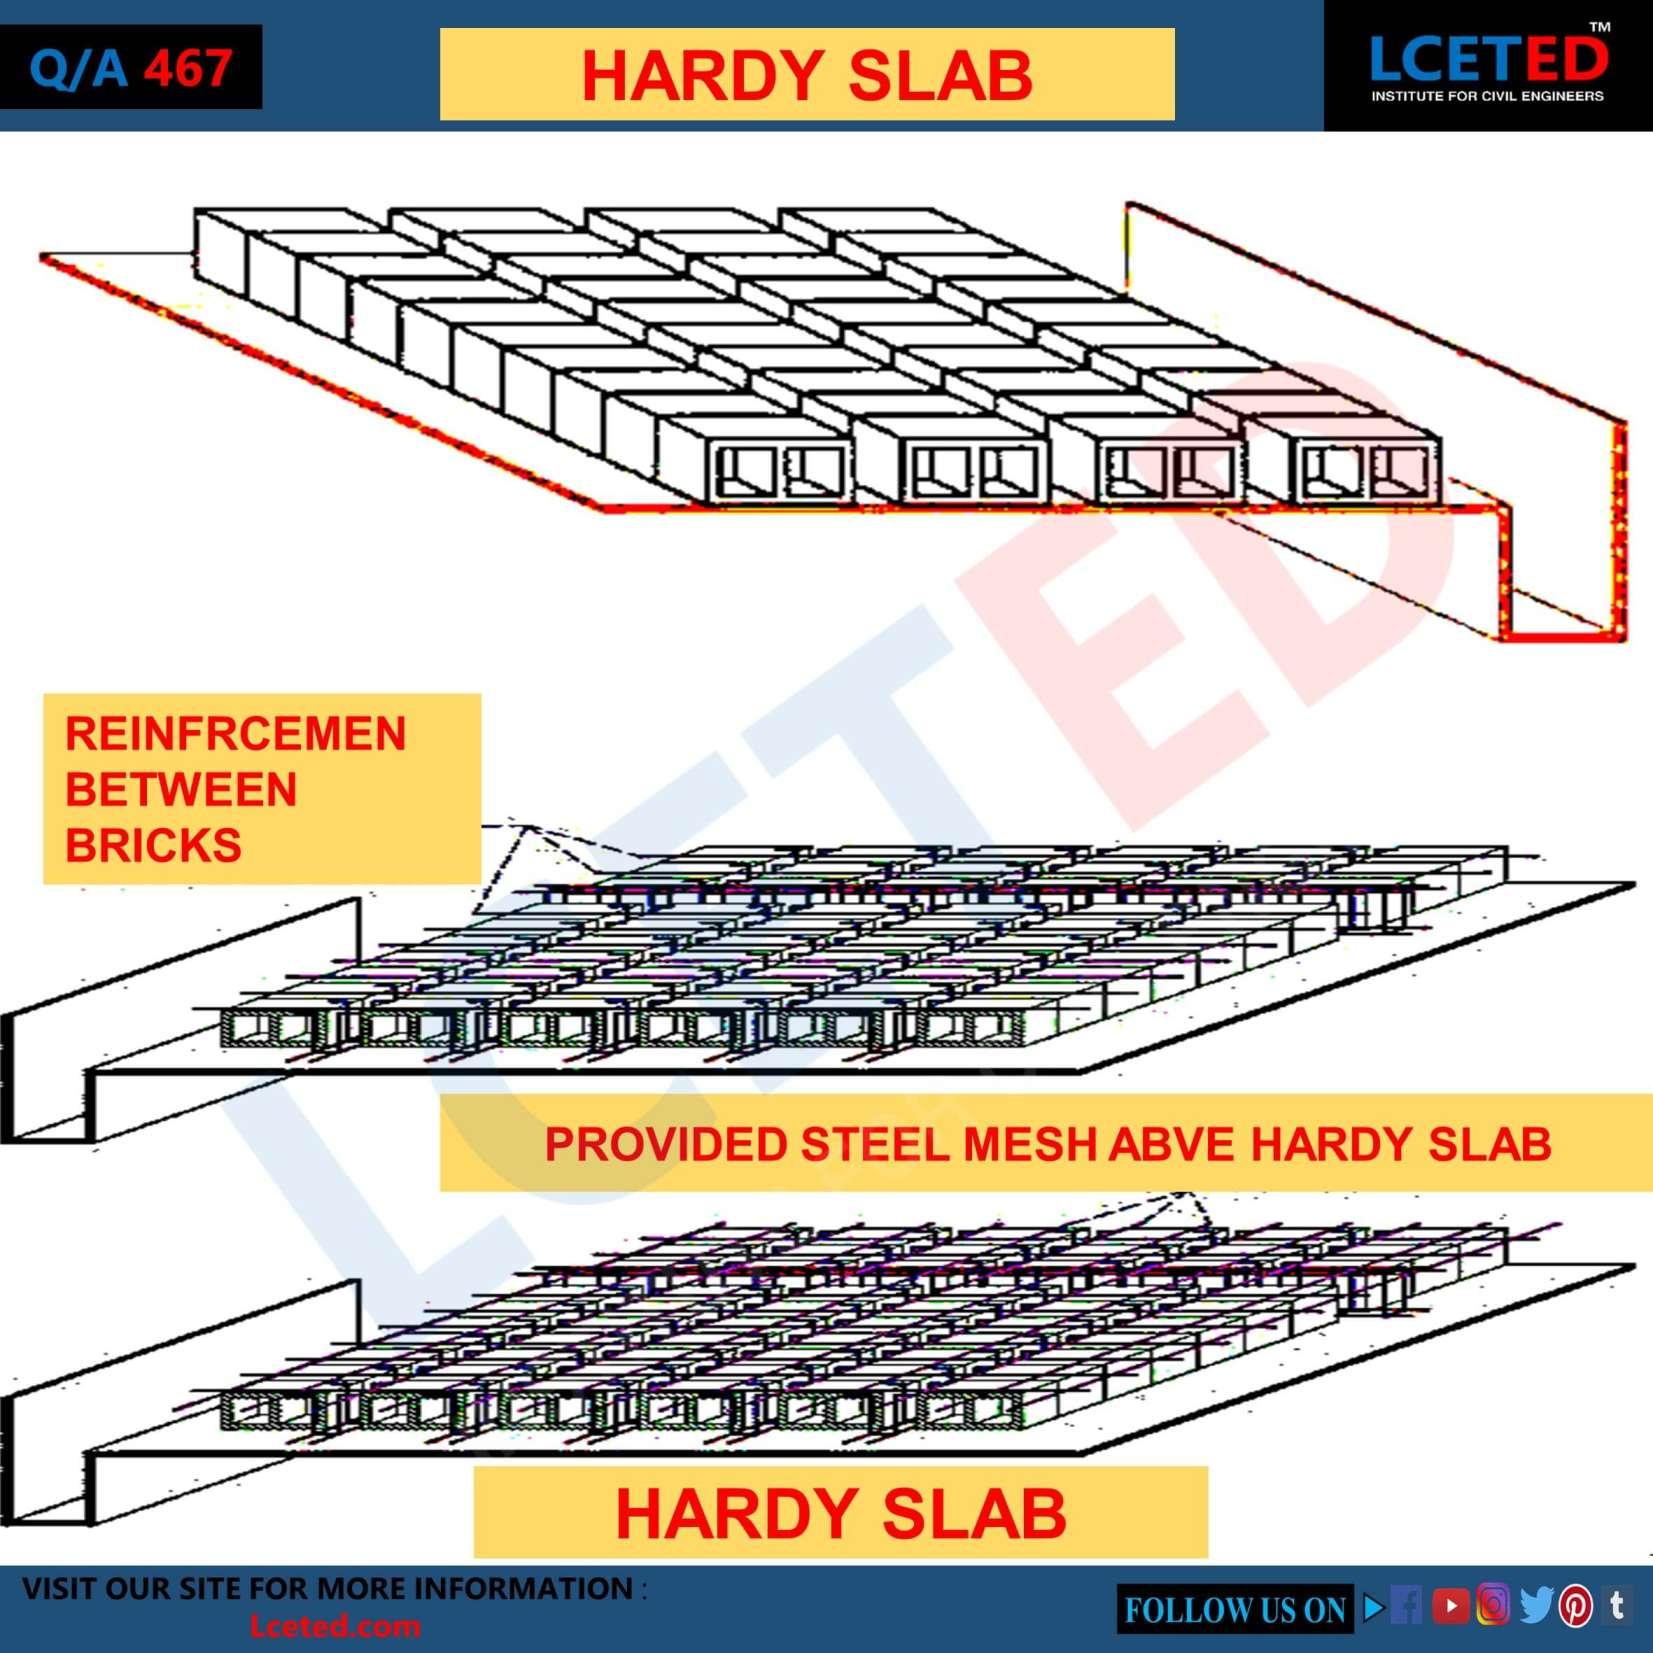 HARDY SLAB